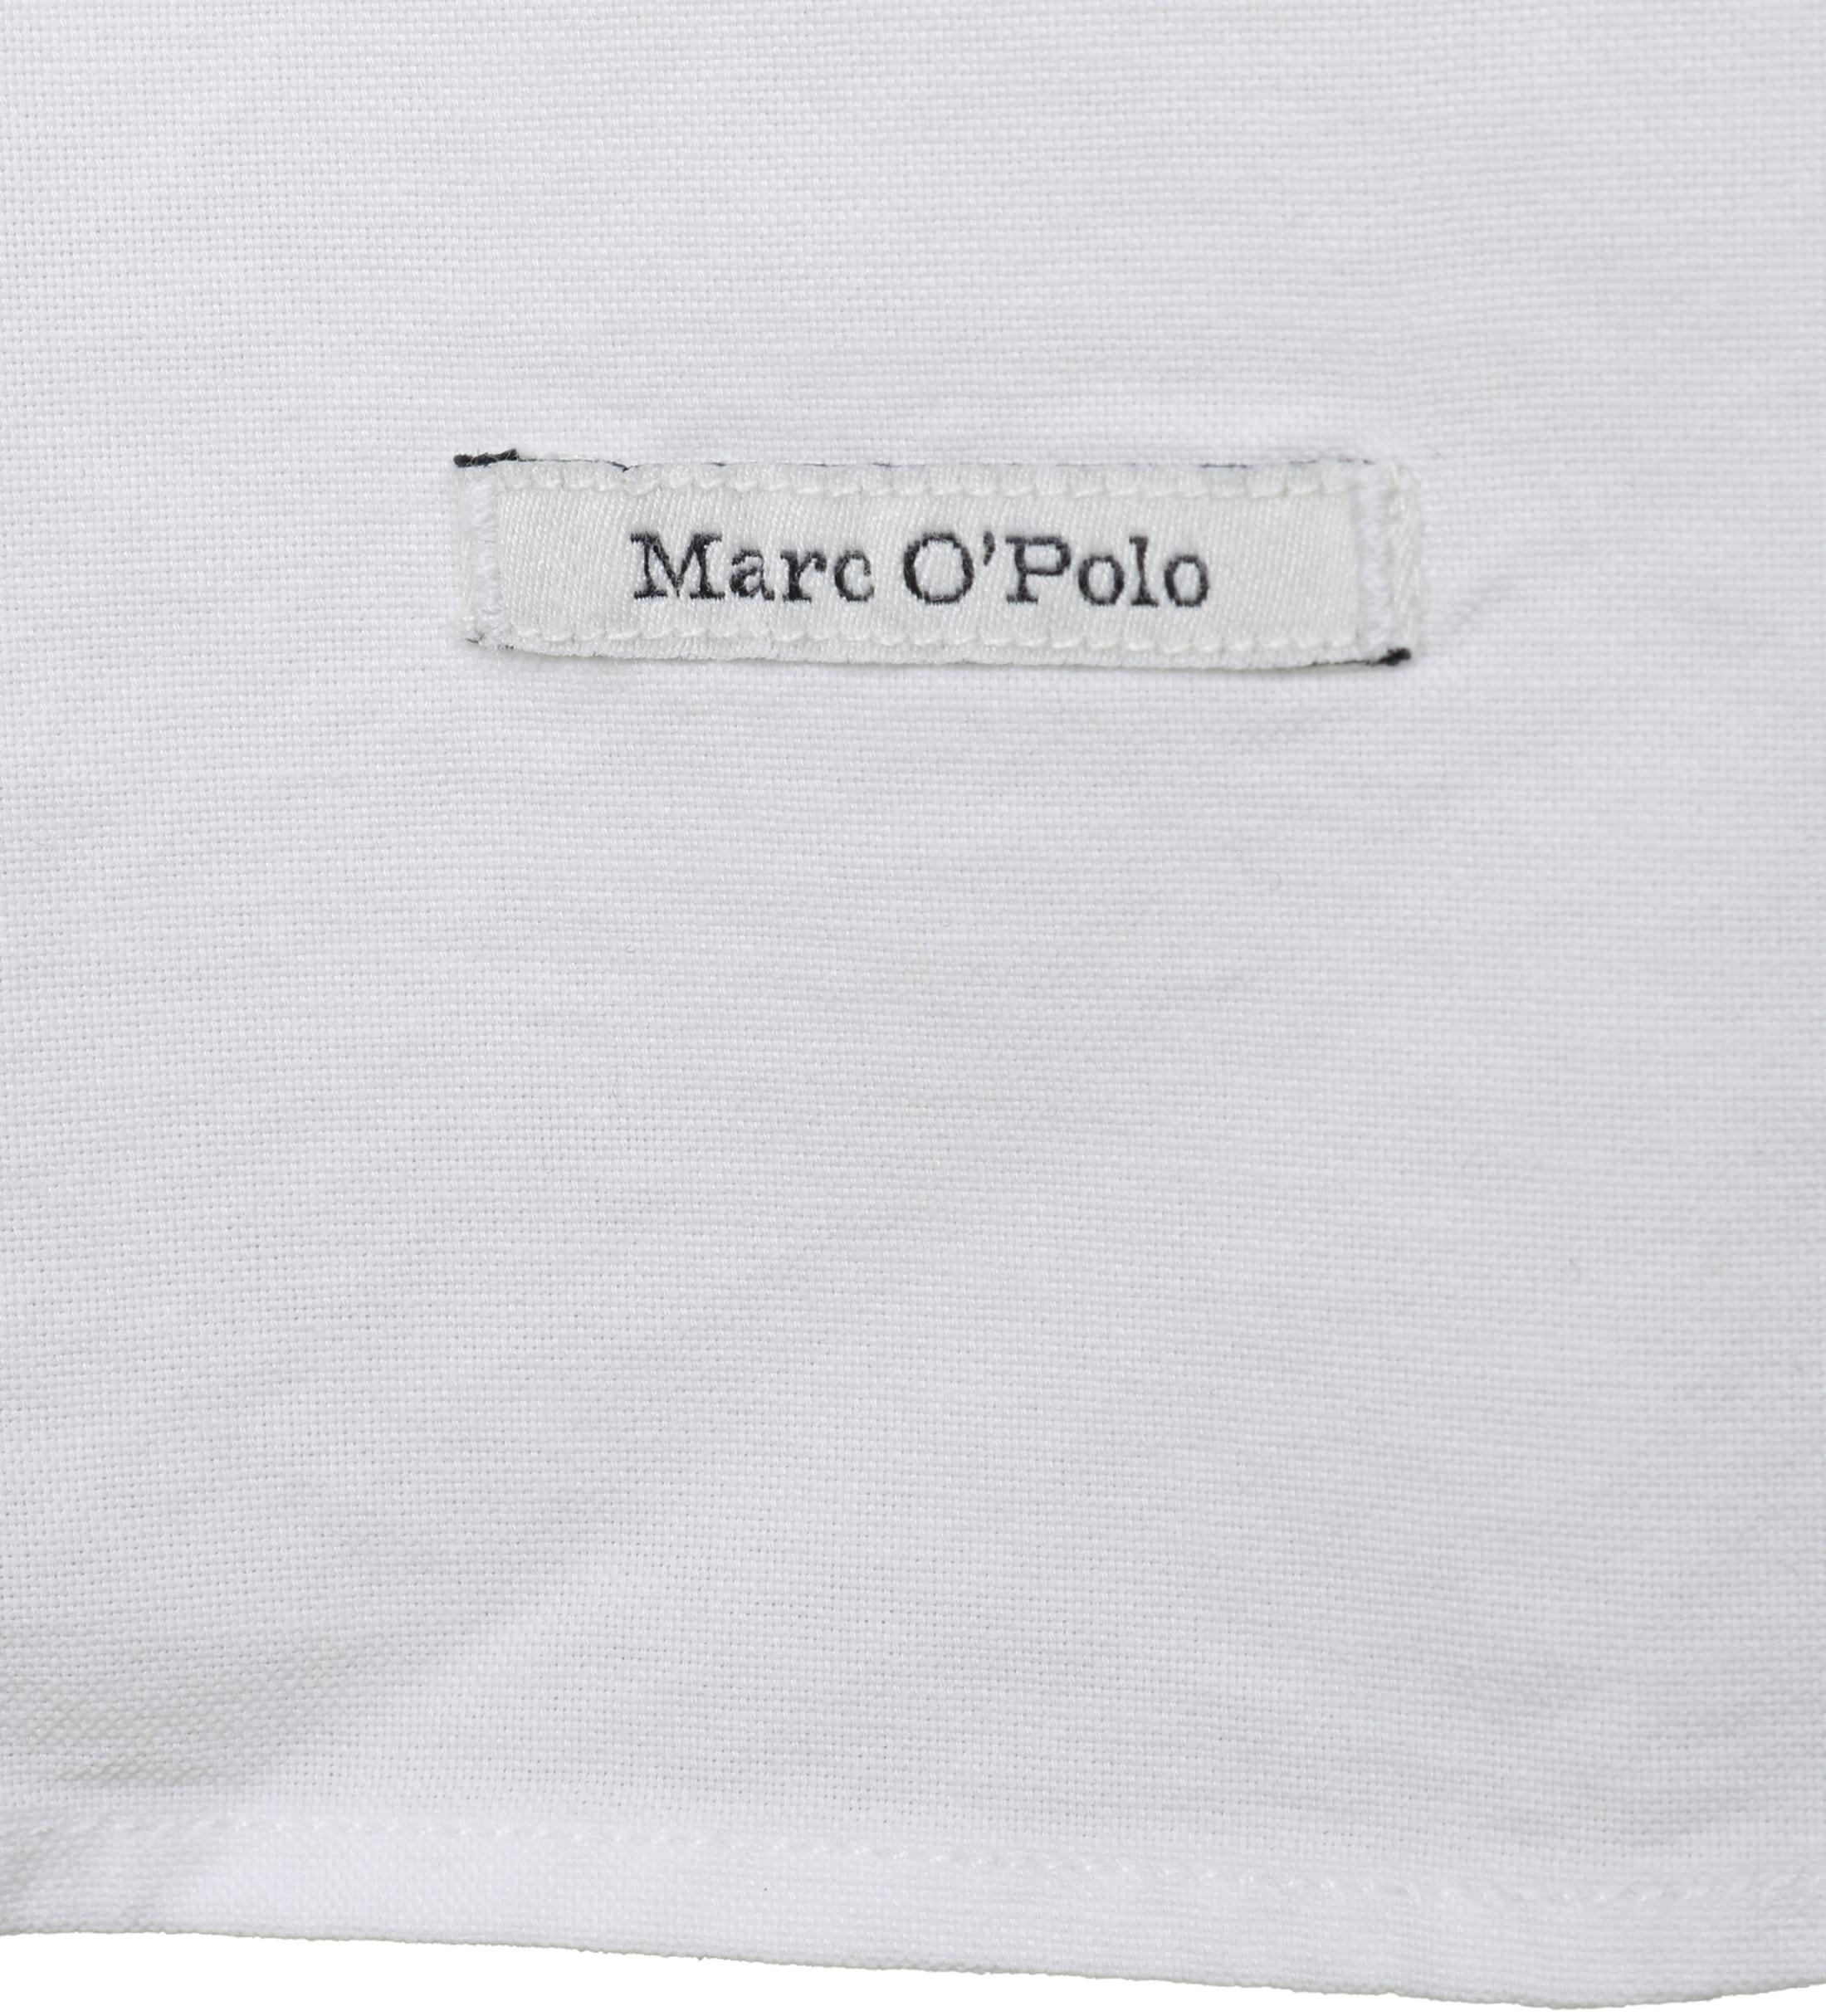 Marc O'Polo Hemd Weiss foto 2